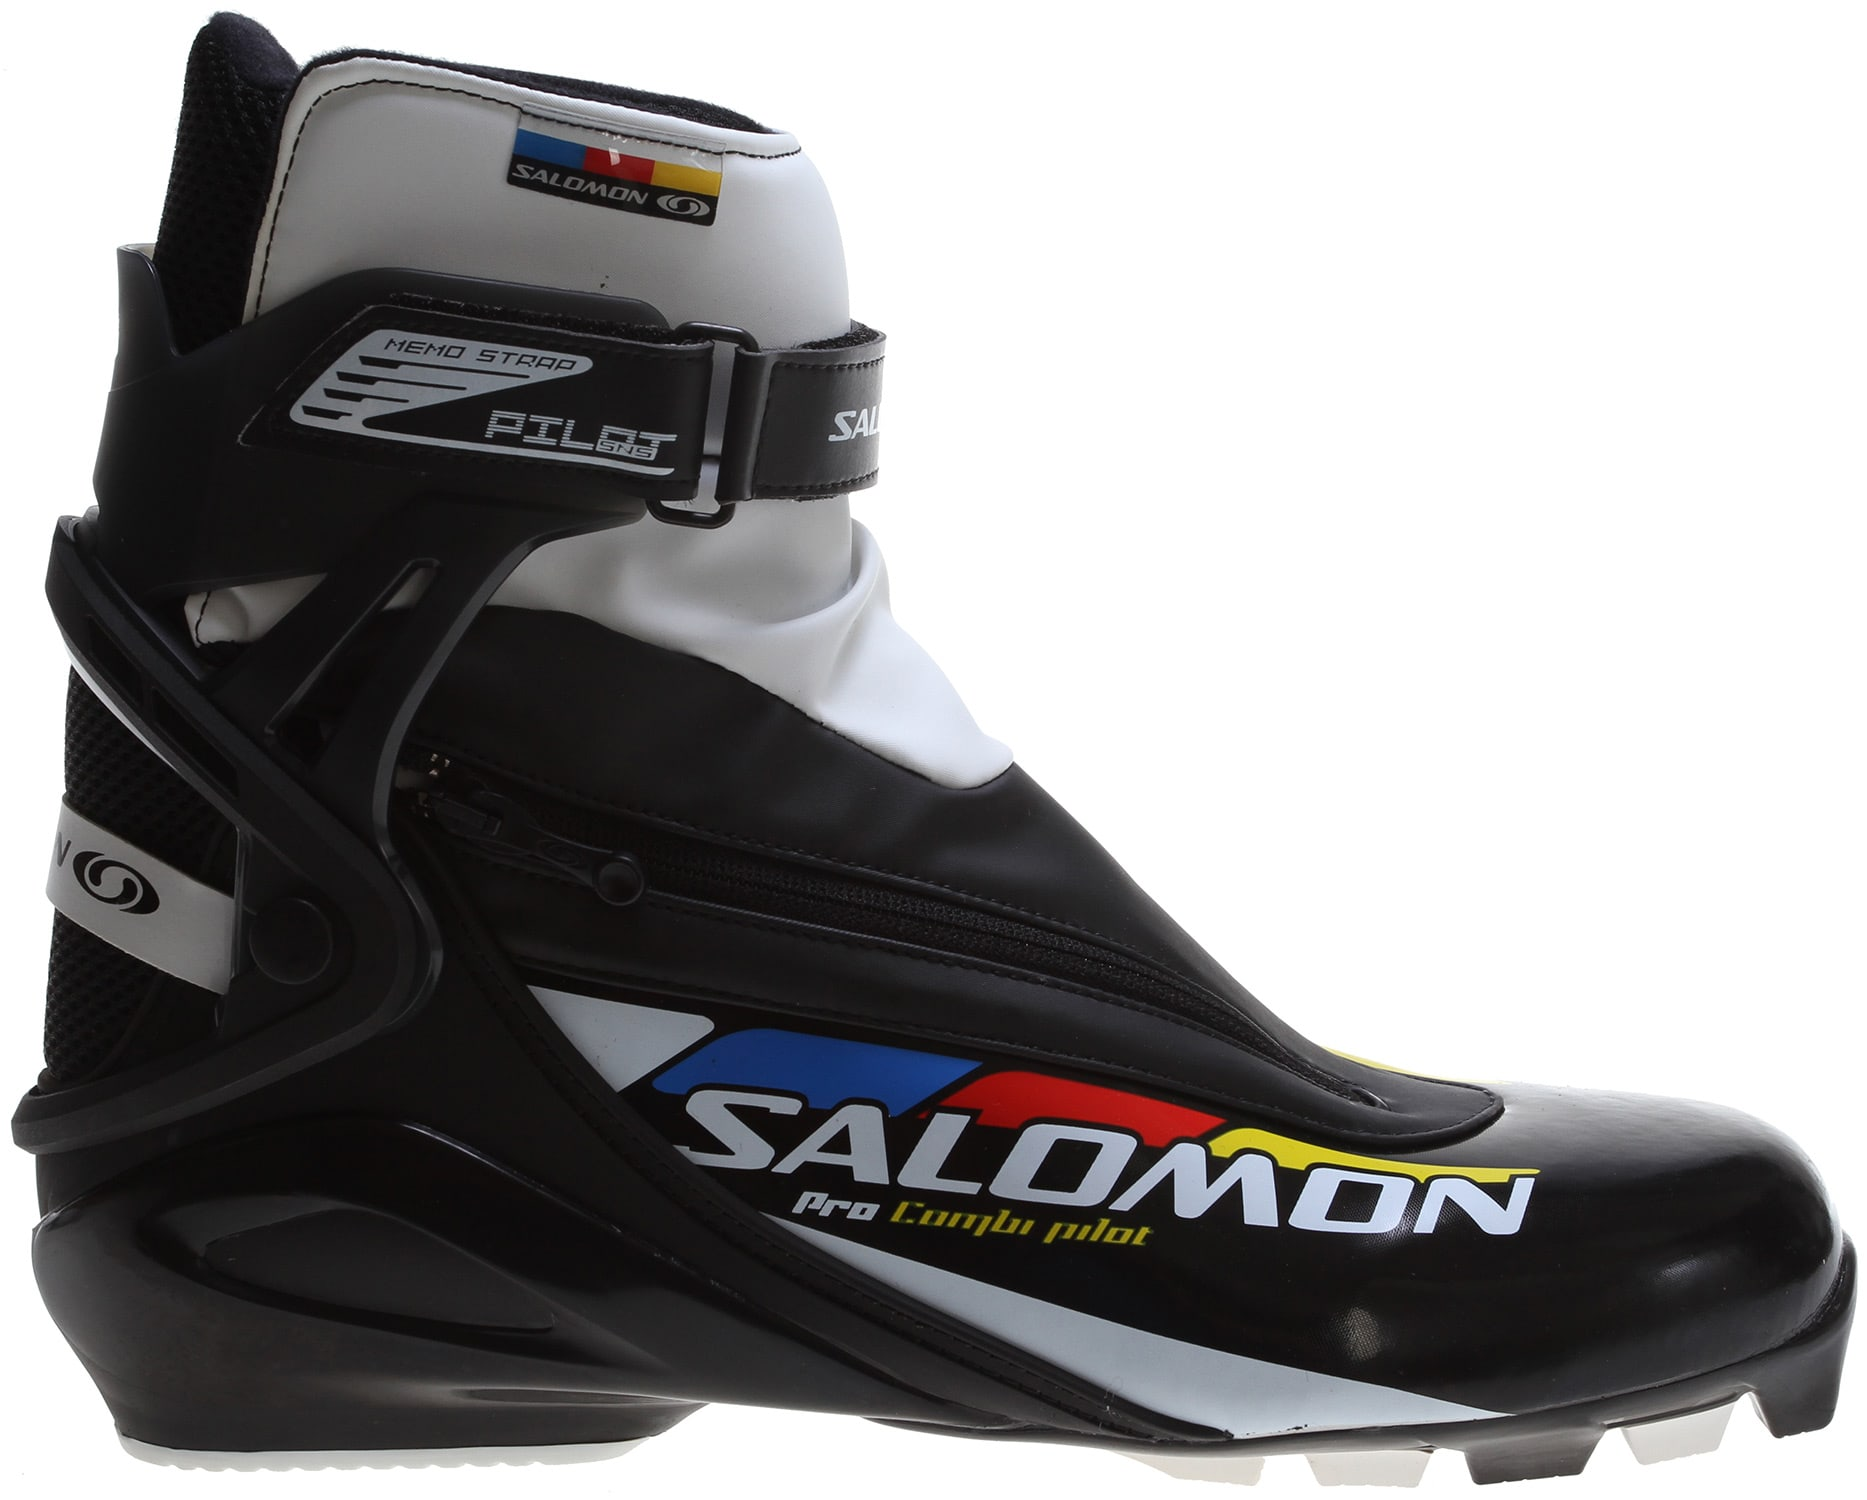 Salomon Pro Combi Pilot Xc Ski Boots